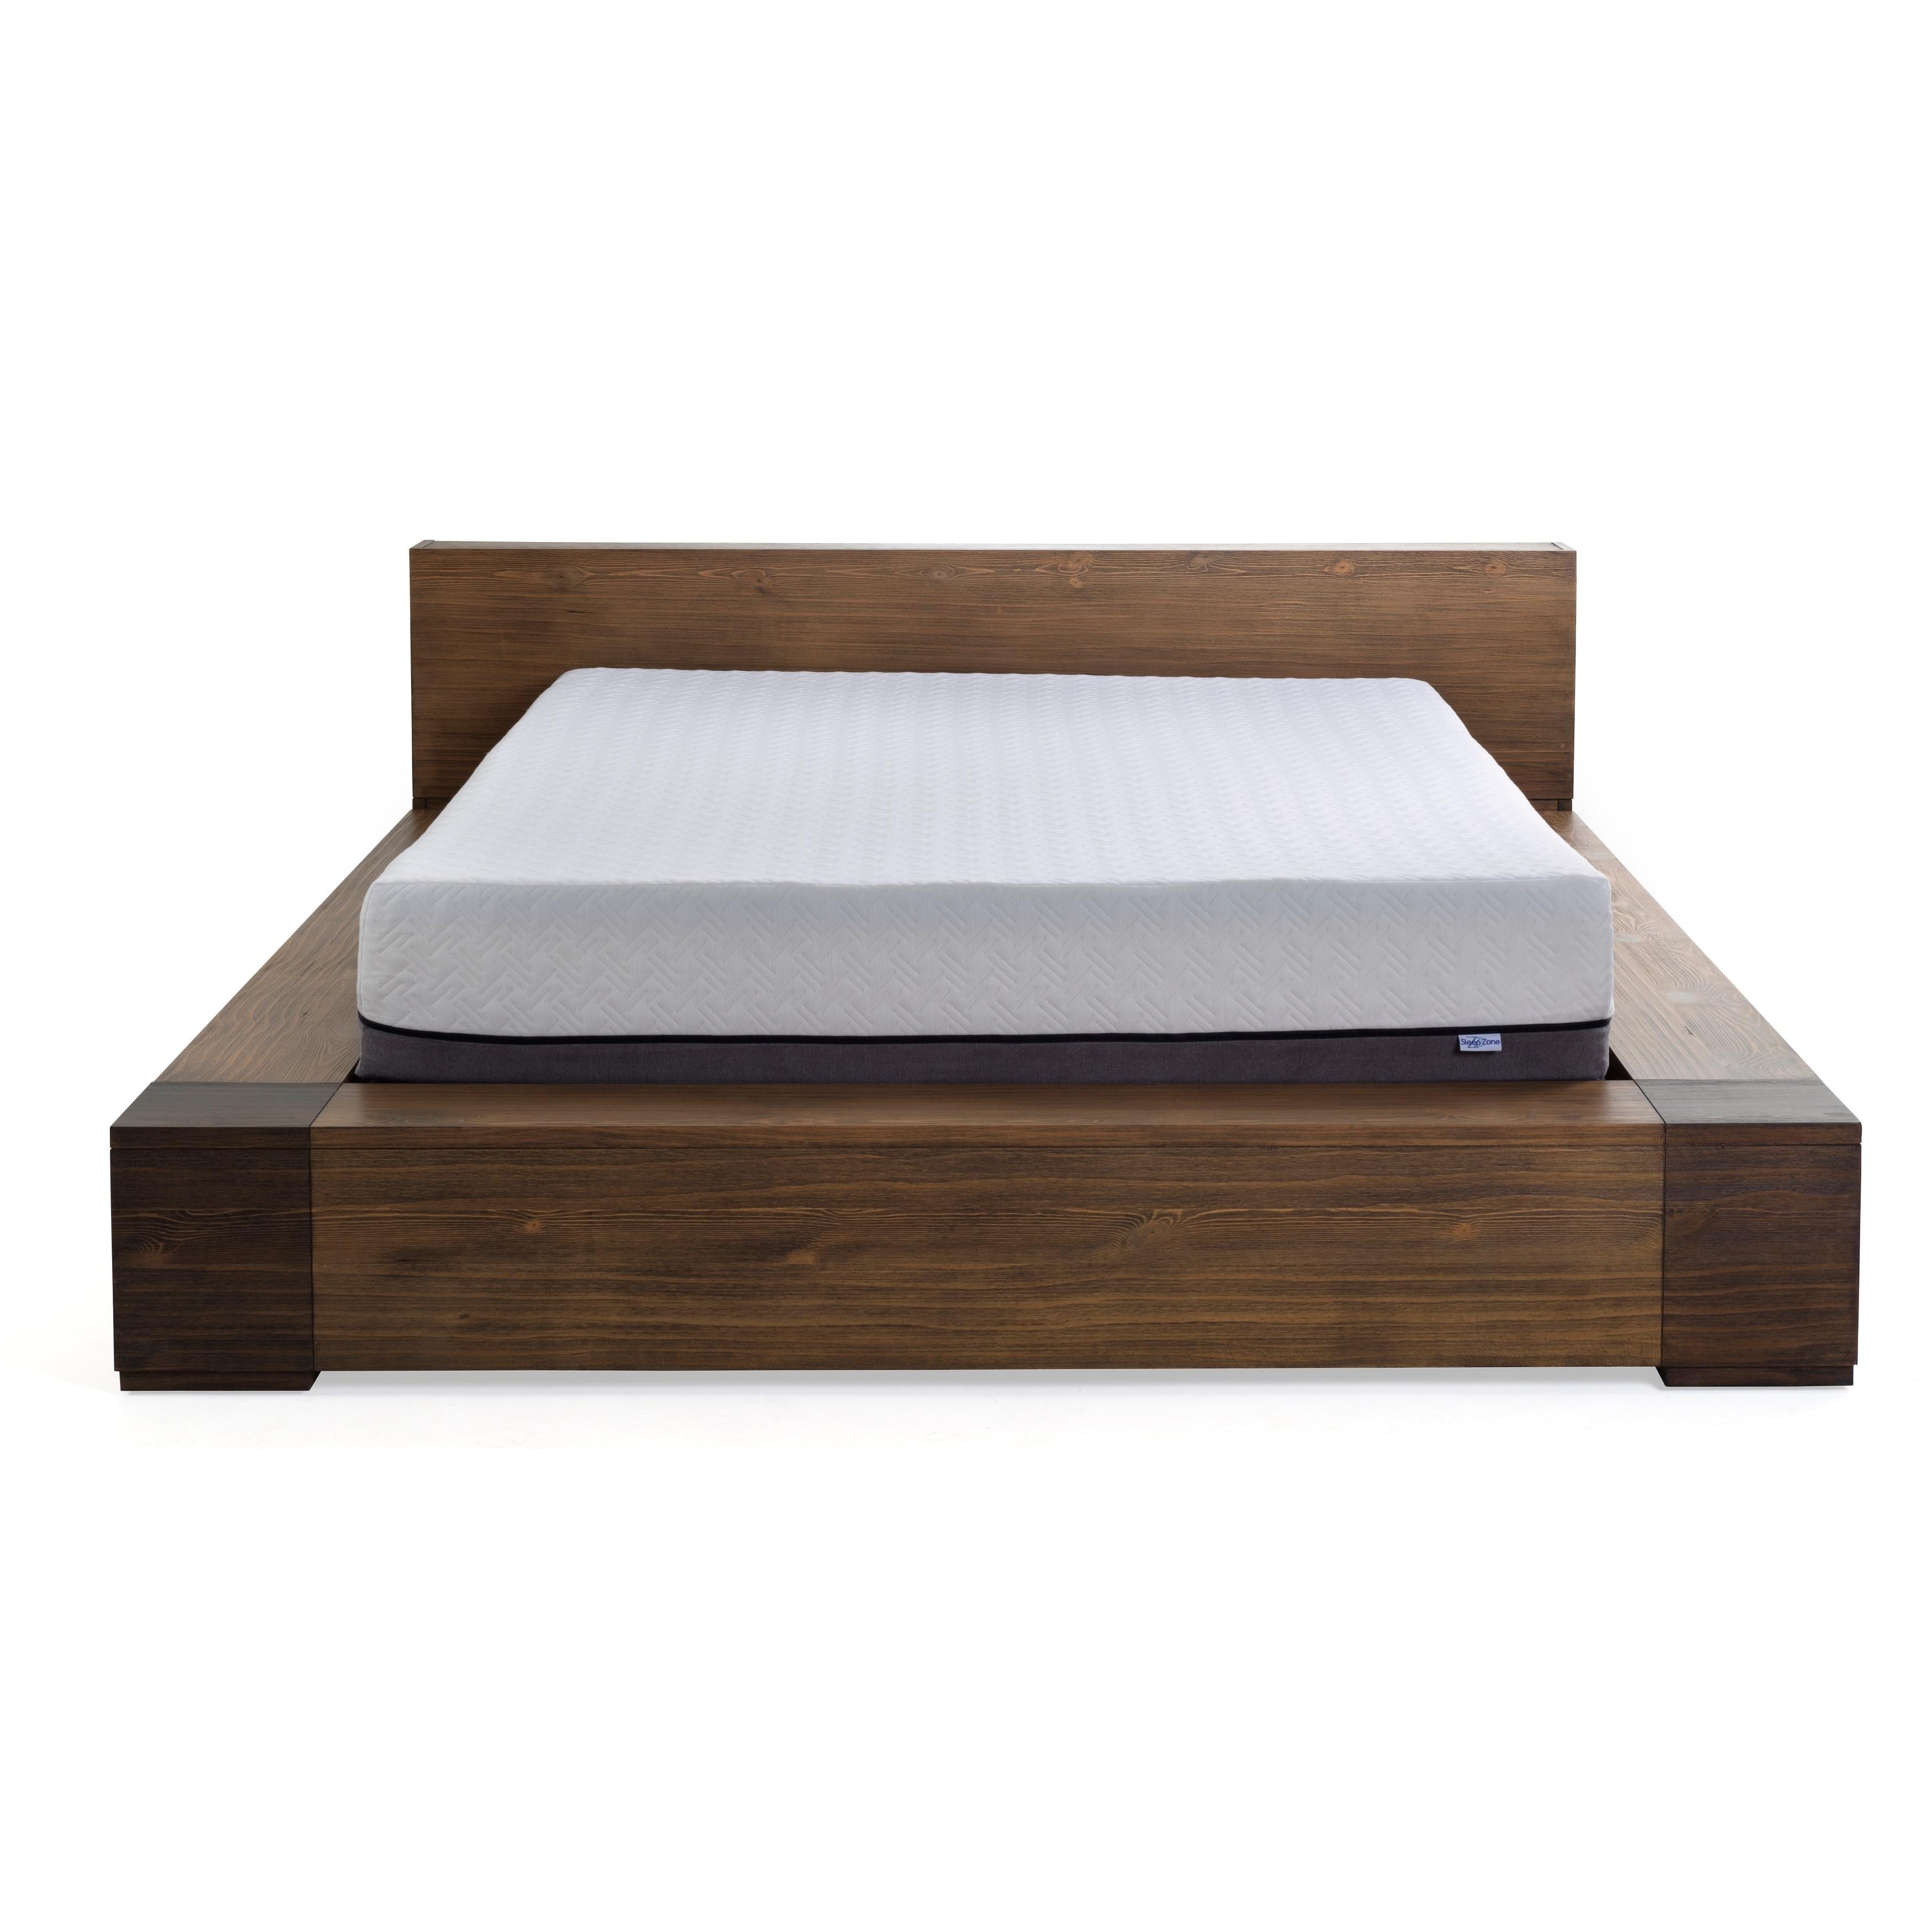 Shop Sleep Zone Huntington 10 Inch Queen Size Memory Foam Mattress